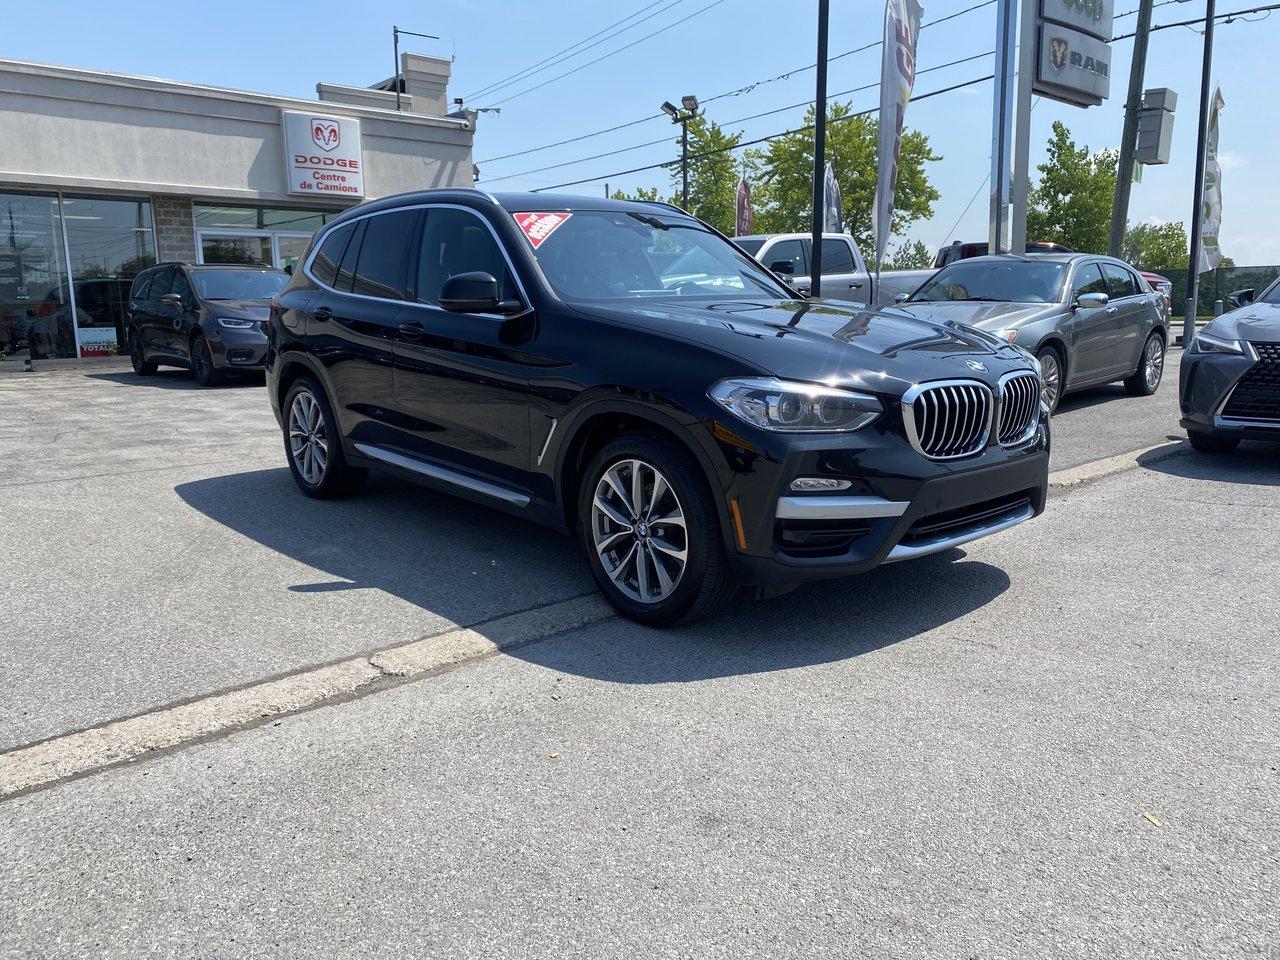 BMW X3 2019 Cuir NEVADA - Toit - GPS - Prix révisé